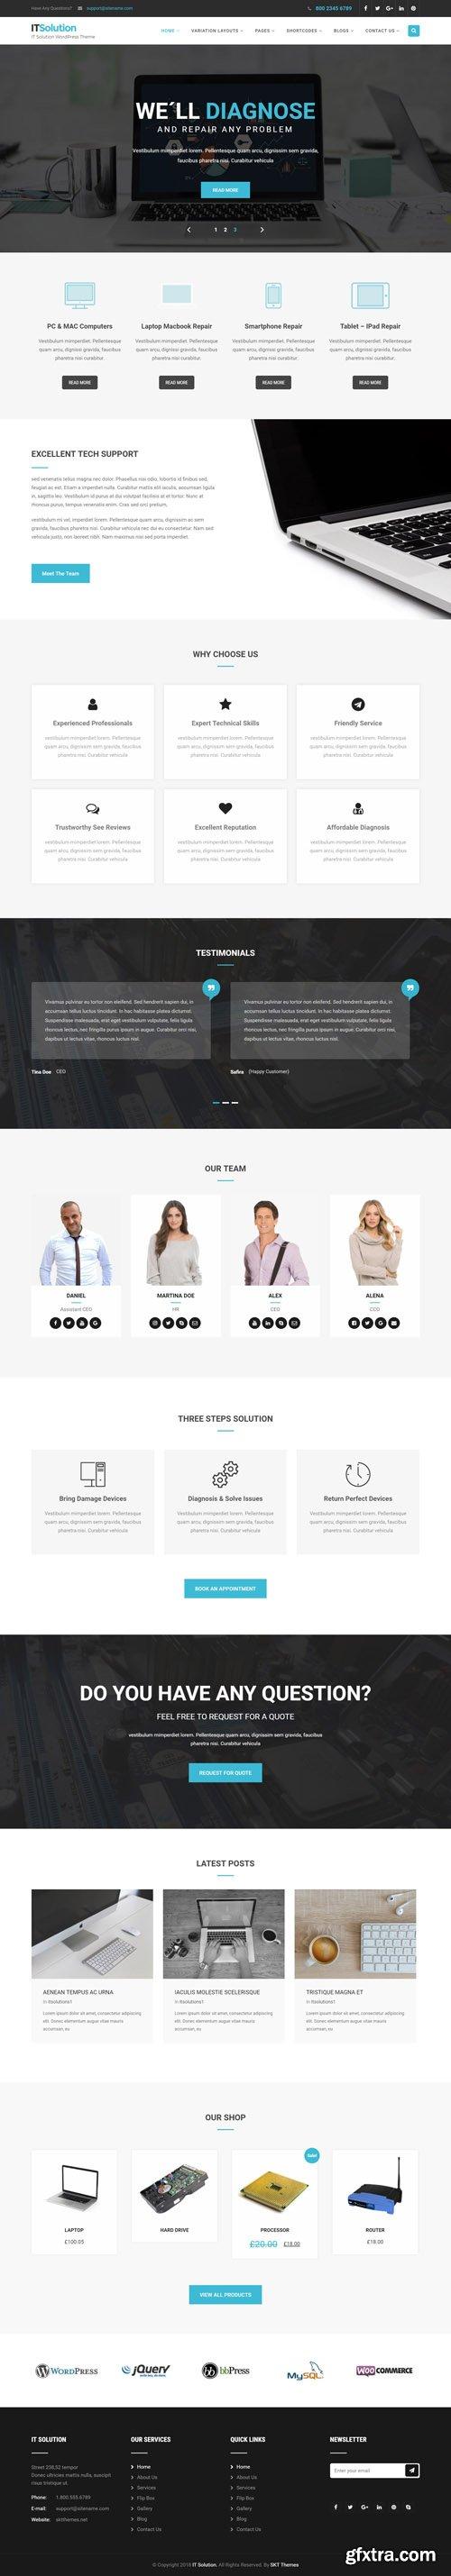 SKT Themes - IT Solutions Pro v1.1 - WordPress Theme